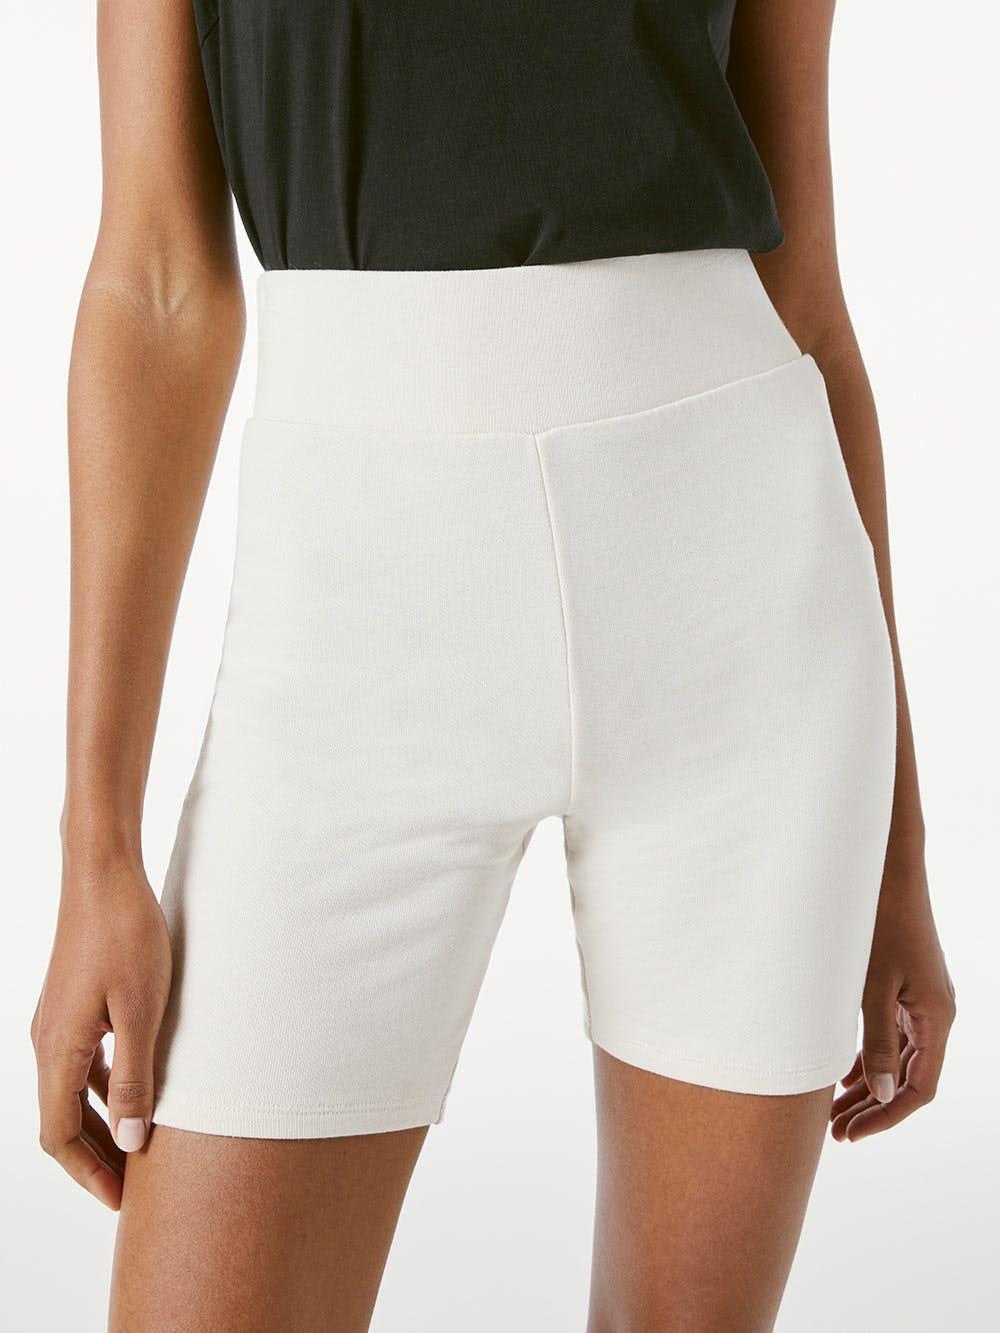 shorts detail view alt:hover